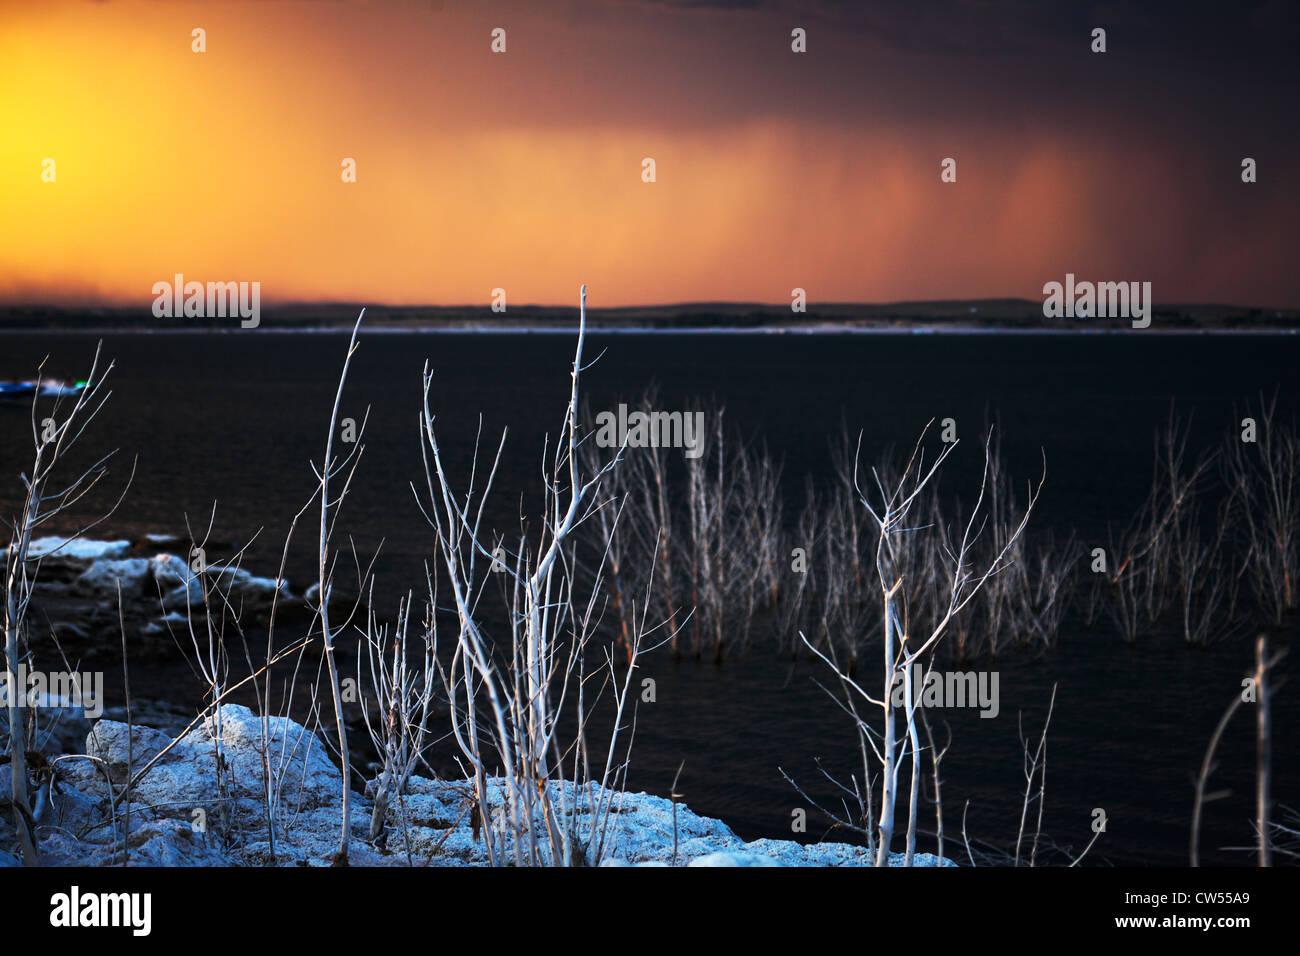 Surreal white dead trees in front of Lake McConaughy in Nebraska, as rain falls, turning the sky orange. - Stock Image